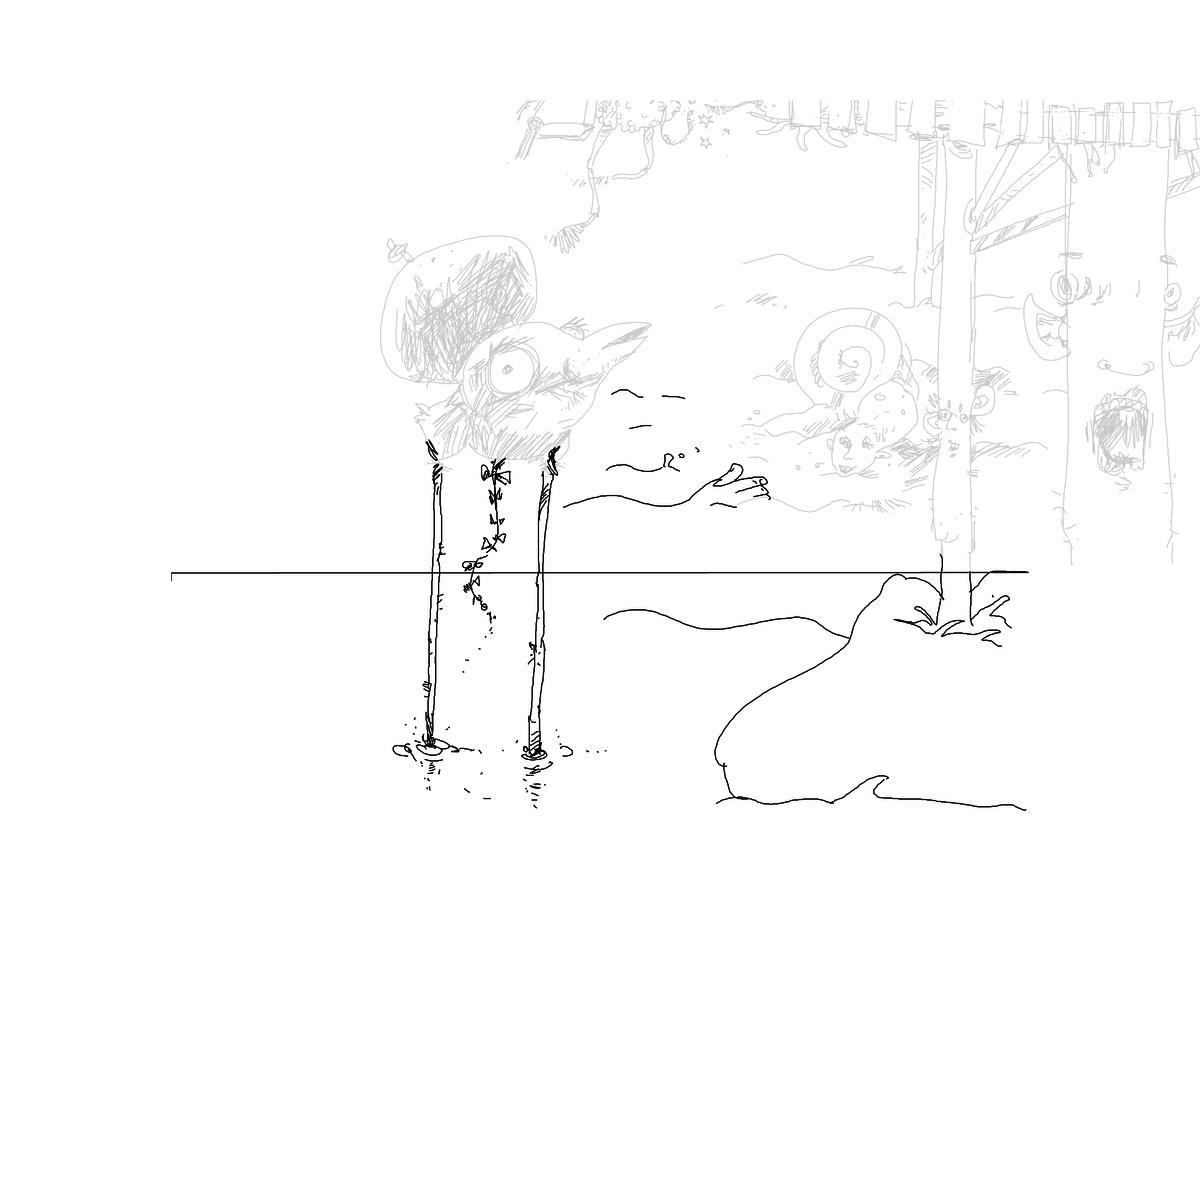 BAAAM drawing#18100 lat:78.4207305908203100lng: -4.4904322624206540